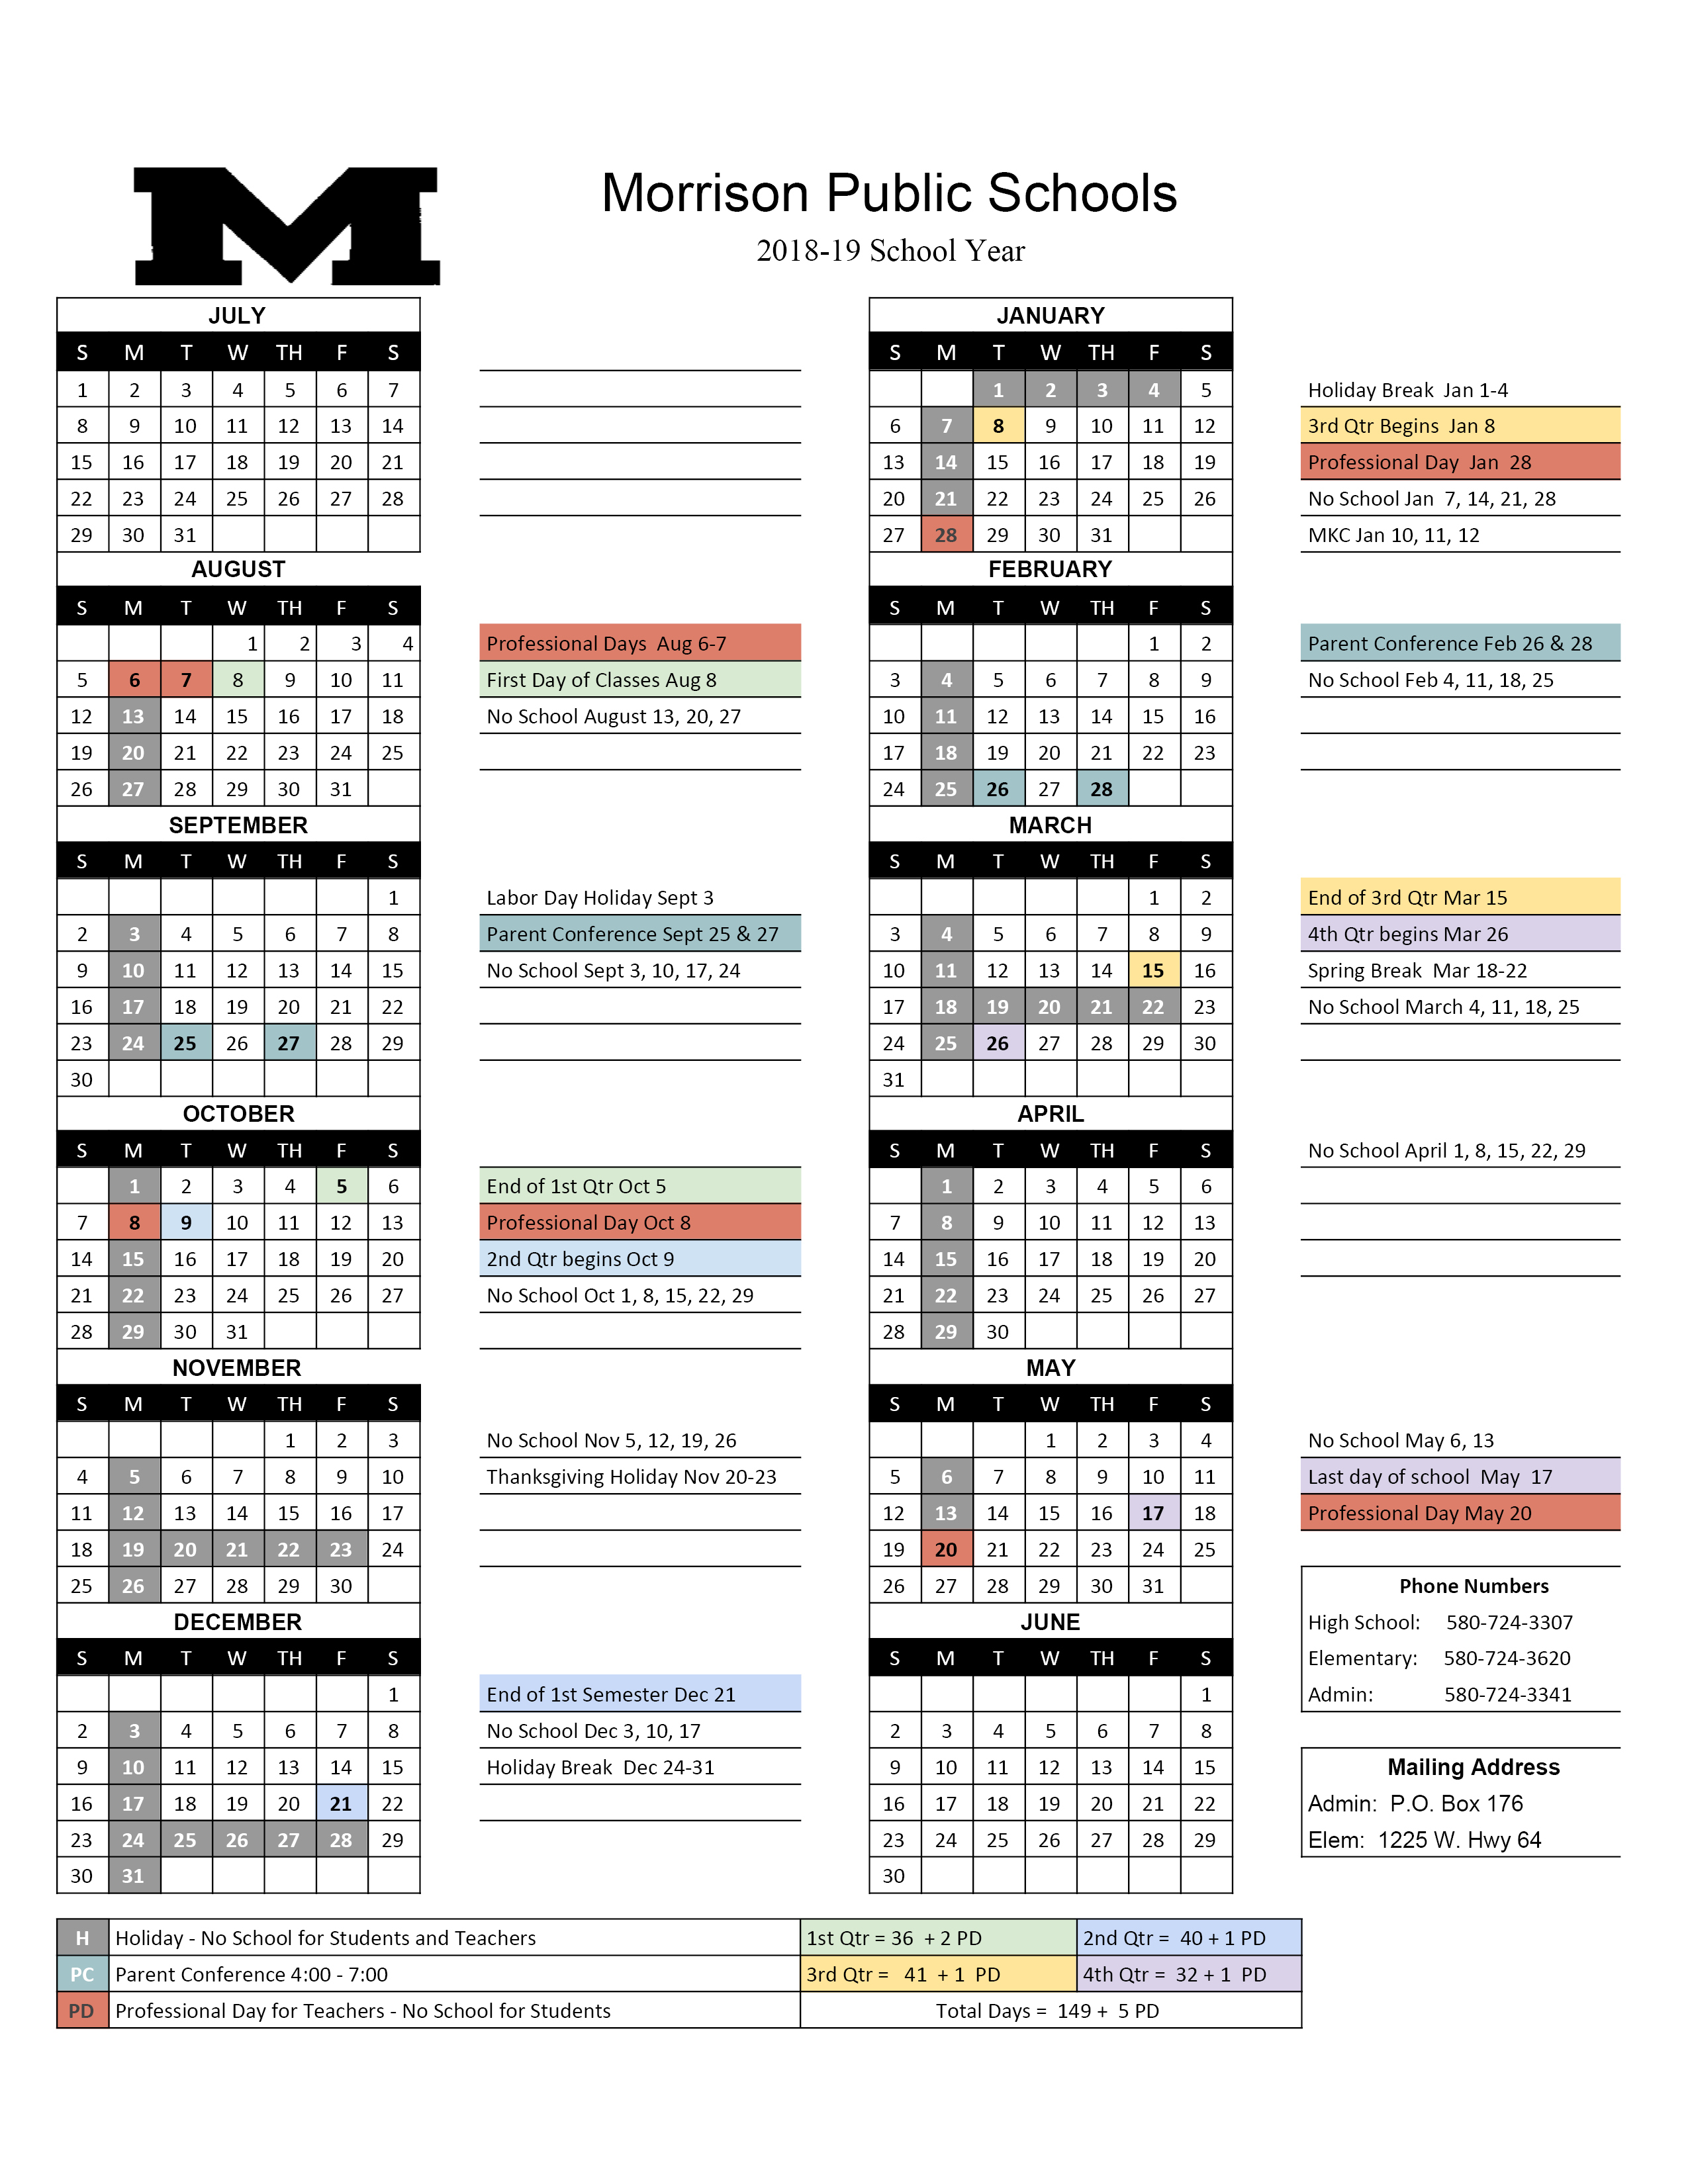 School Calendar < Morrison Public Schools